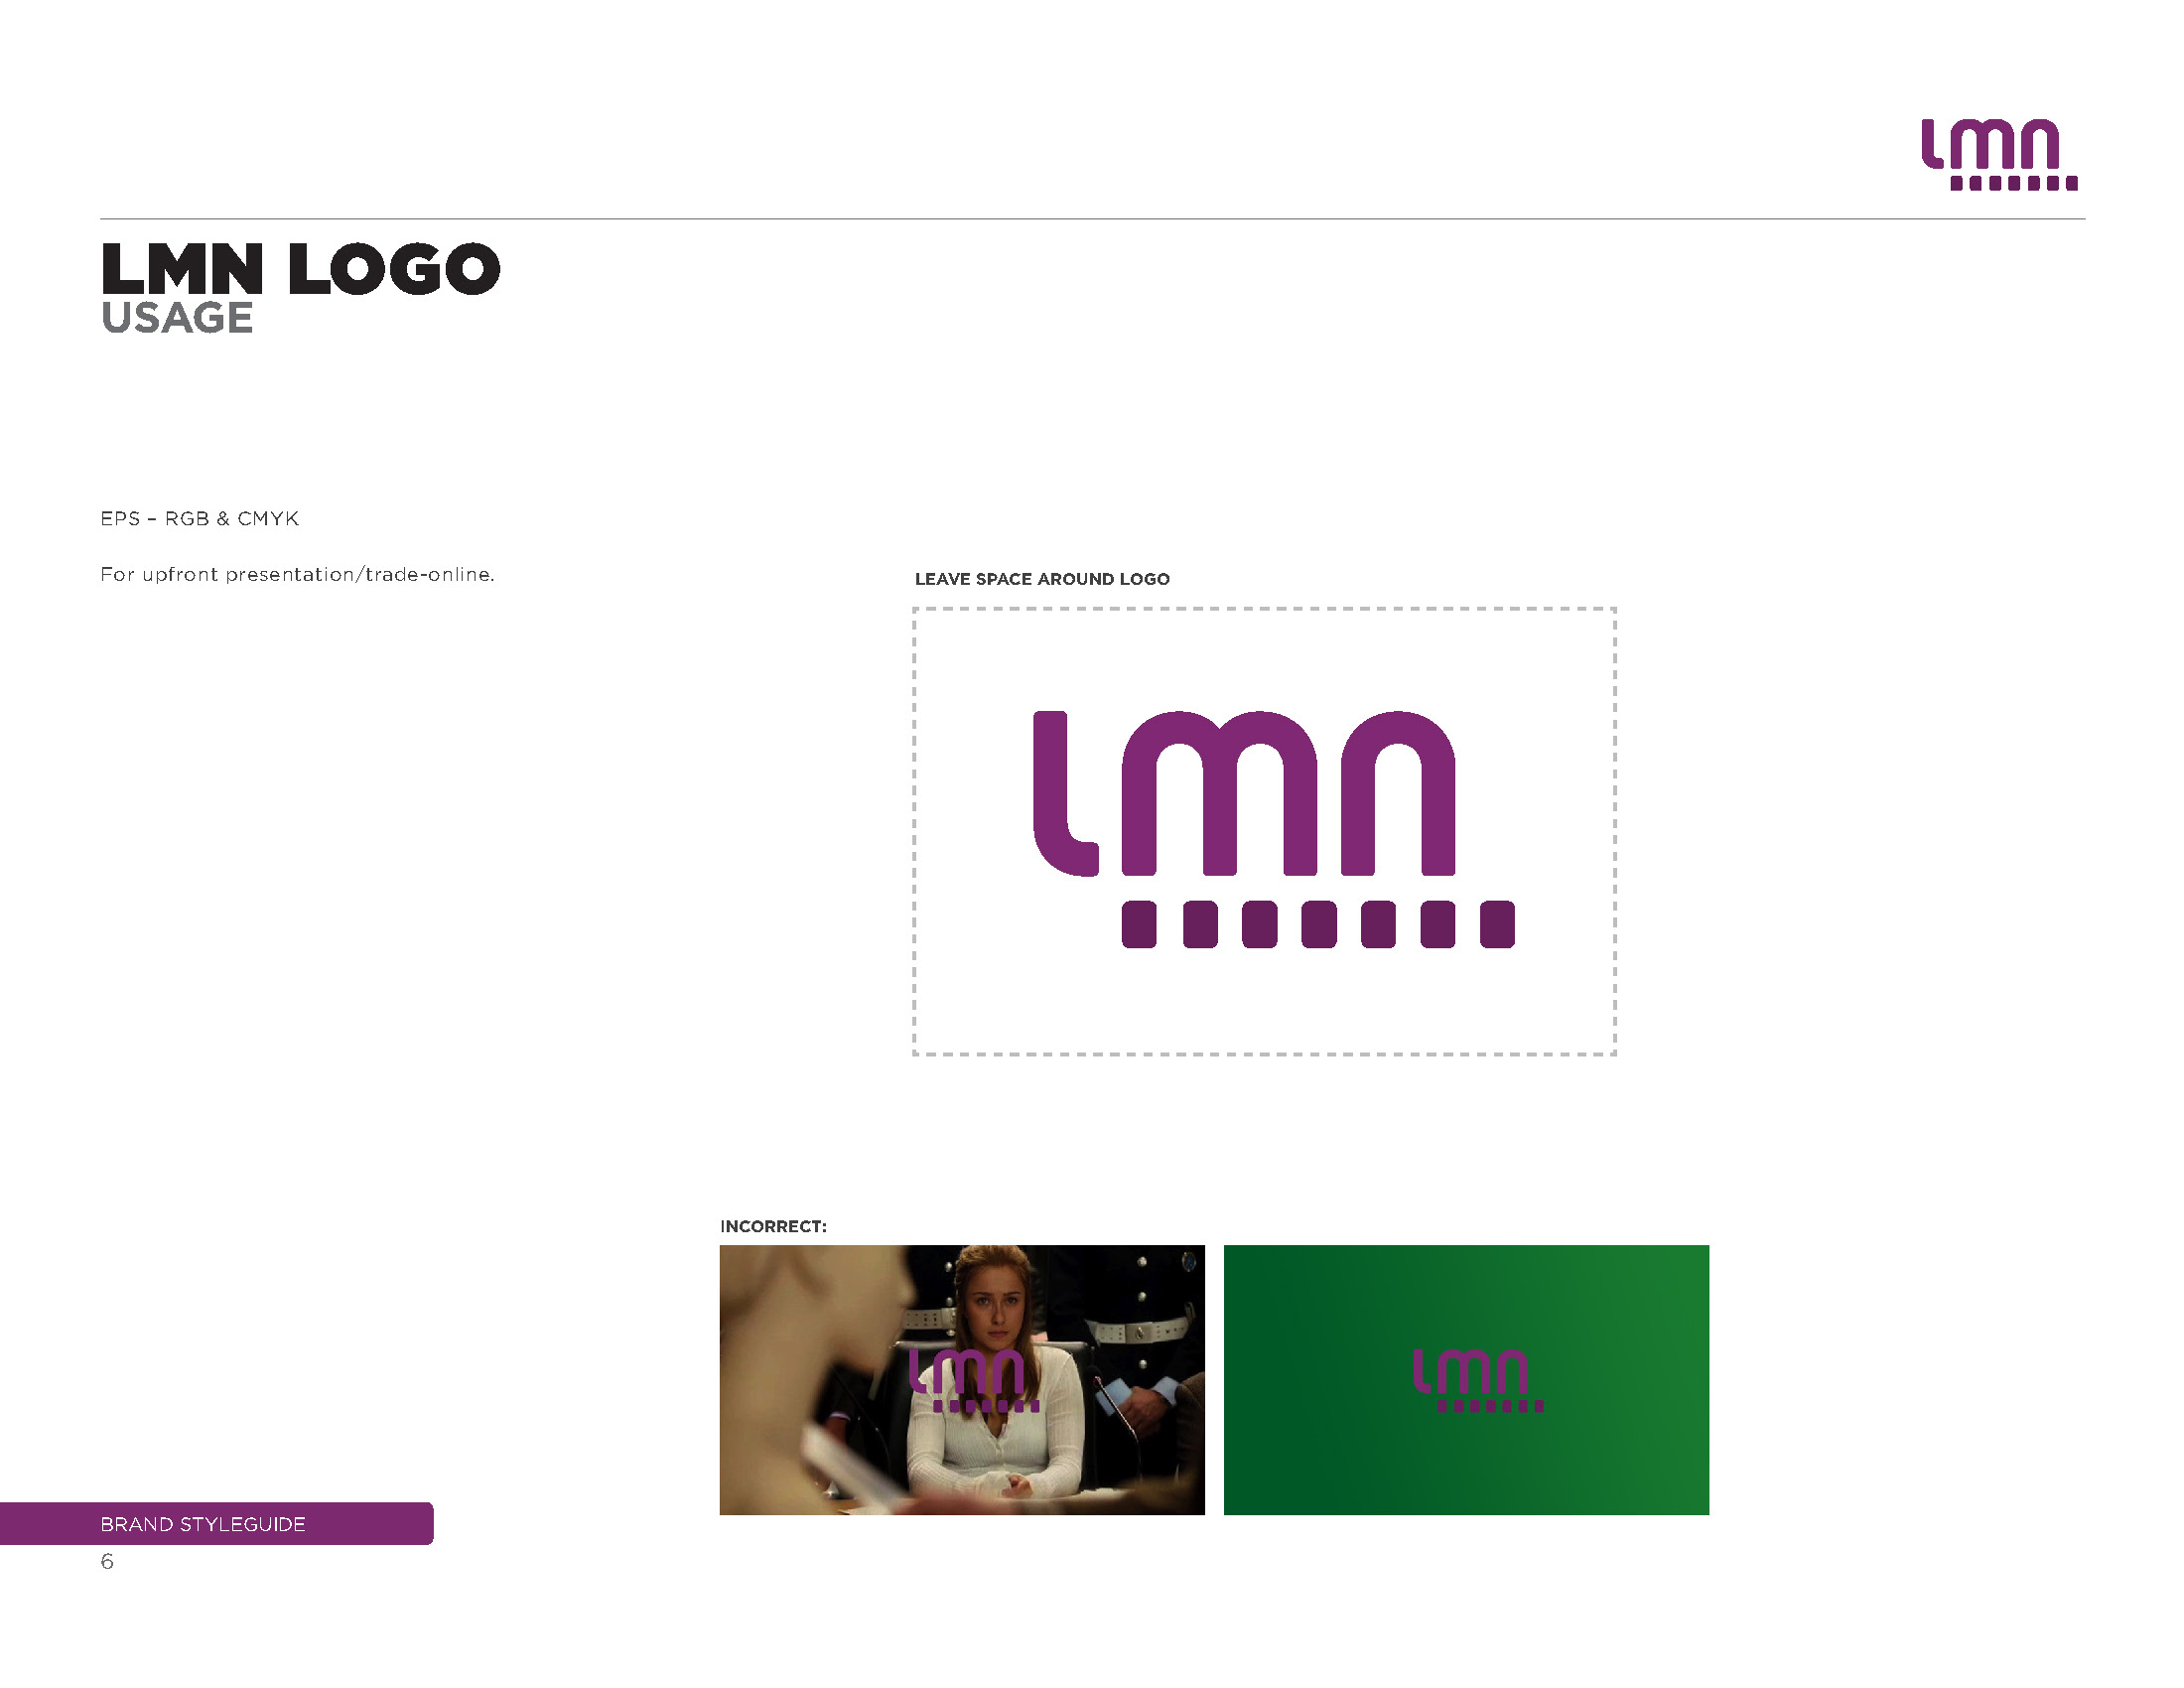 LMN_styleguide_092711_HQ_Page_06.jpg